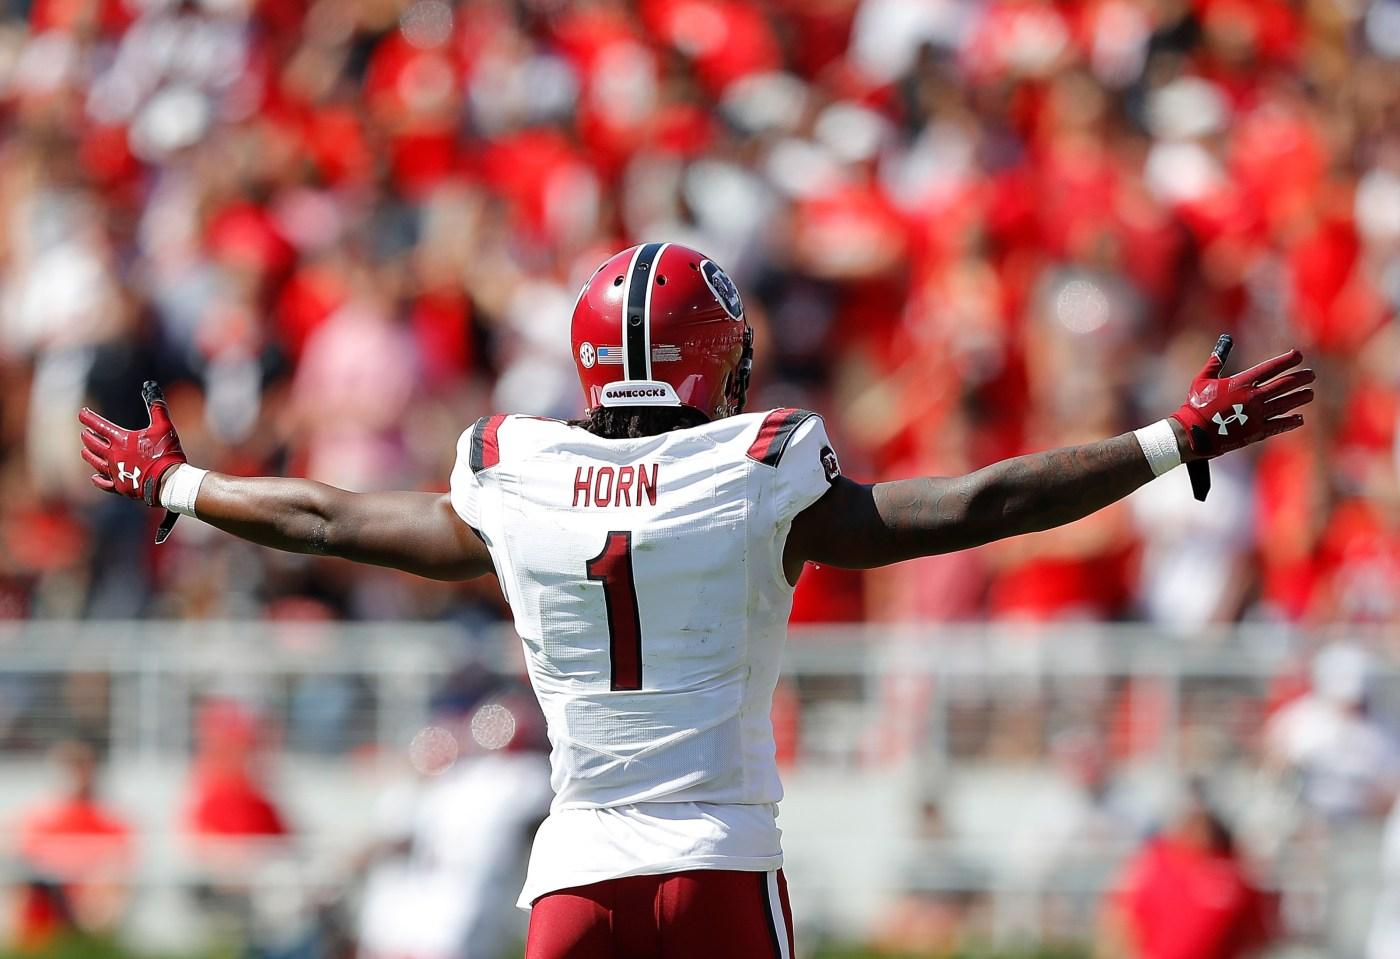 2021 NFL Draft: South Carolina CB Jaycee Horn scouting profile